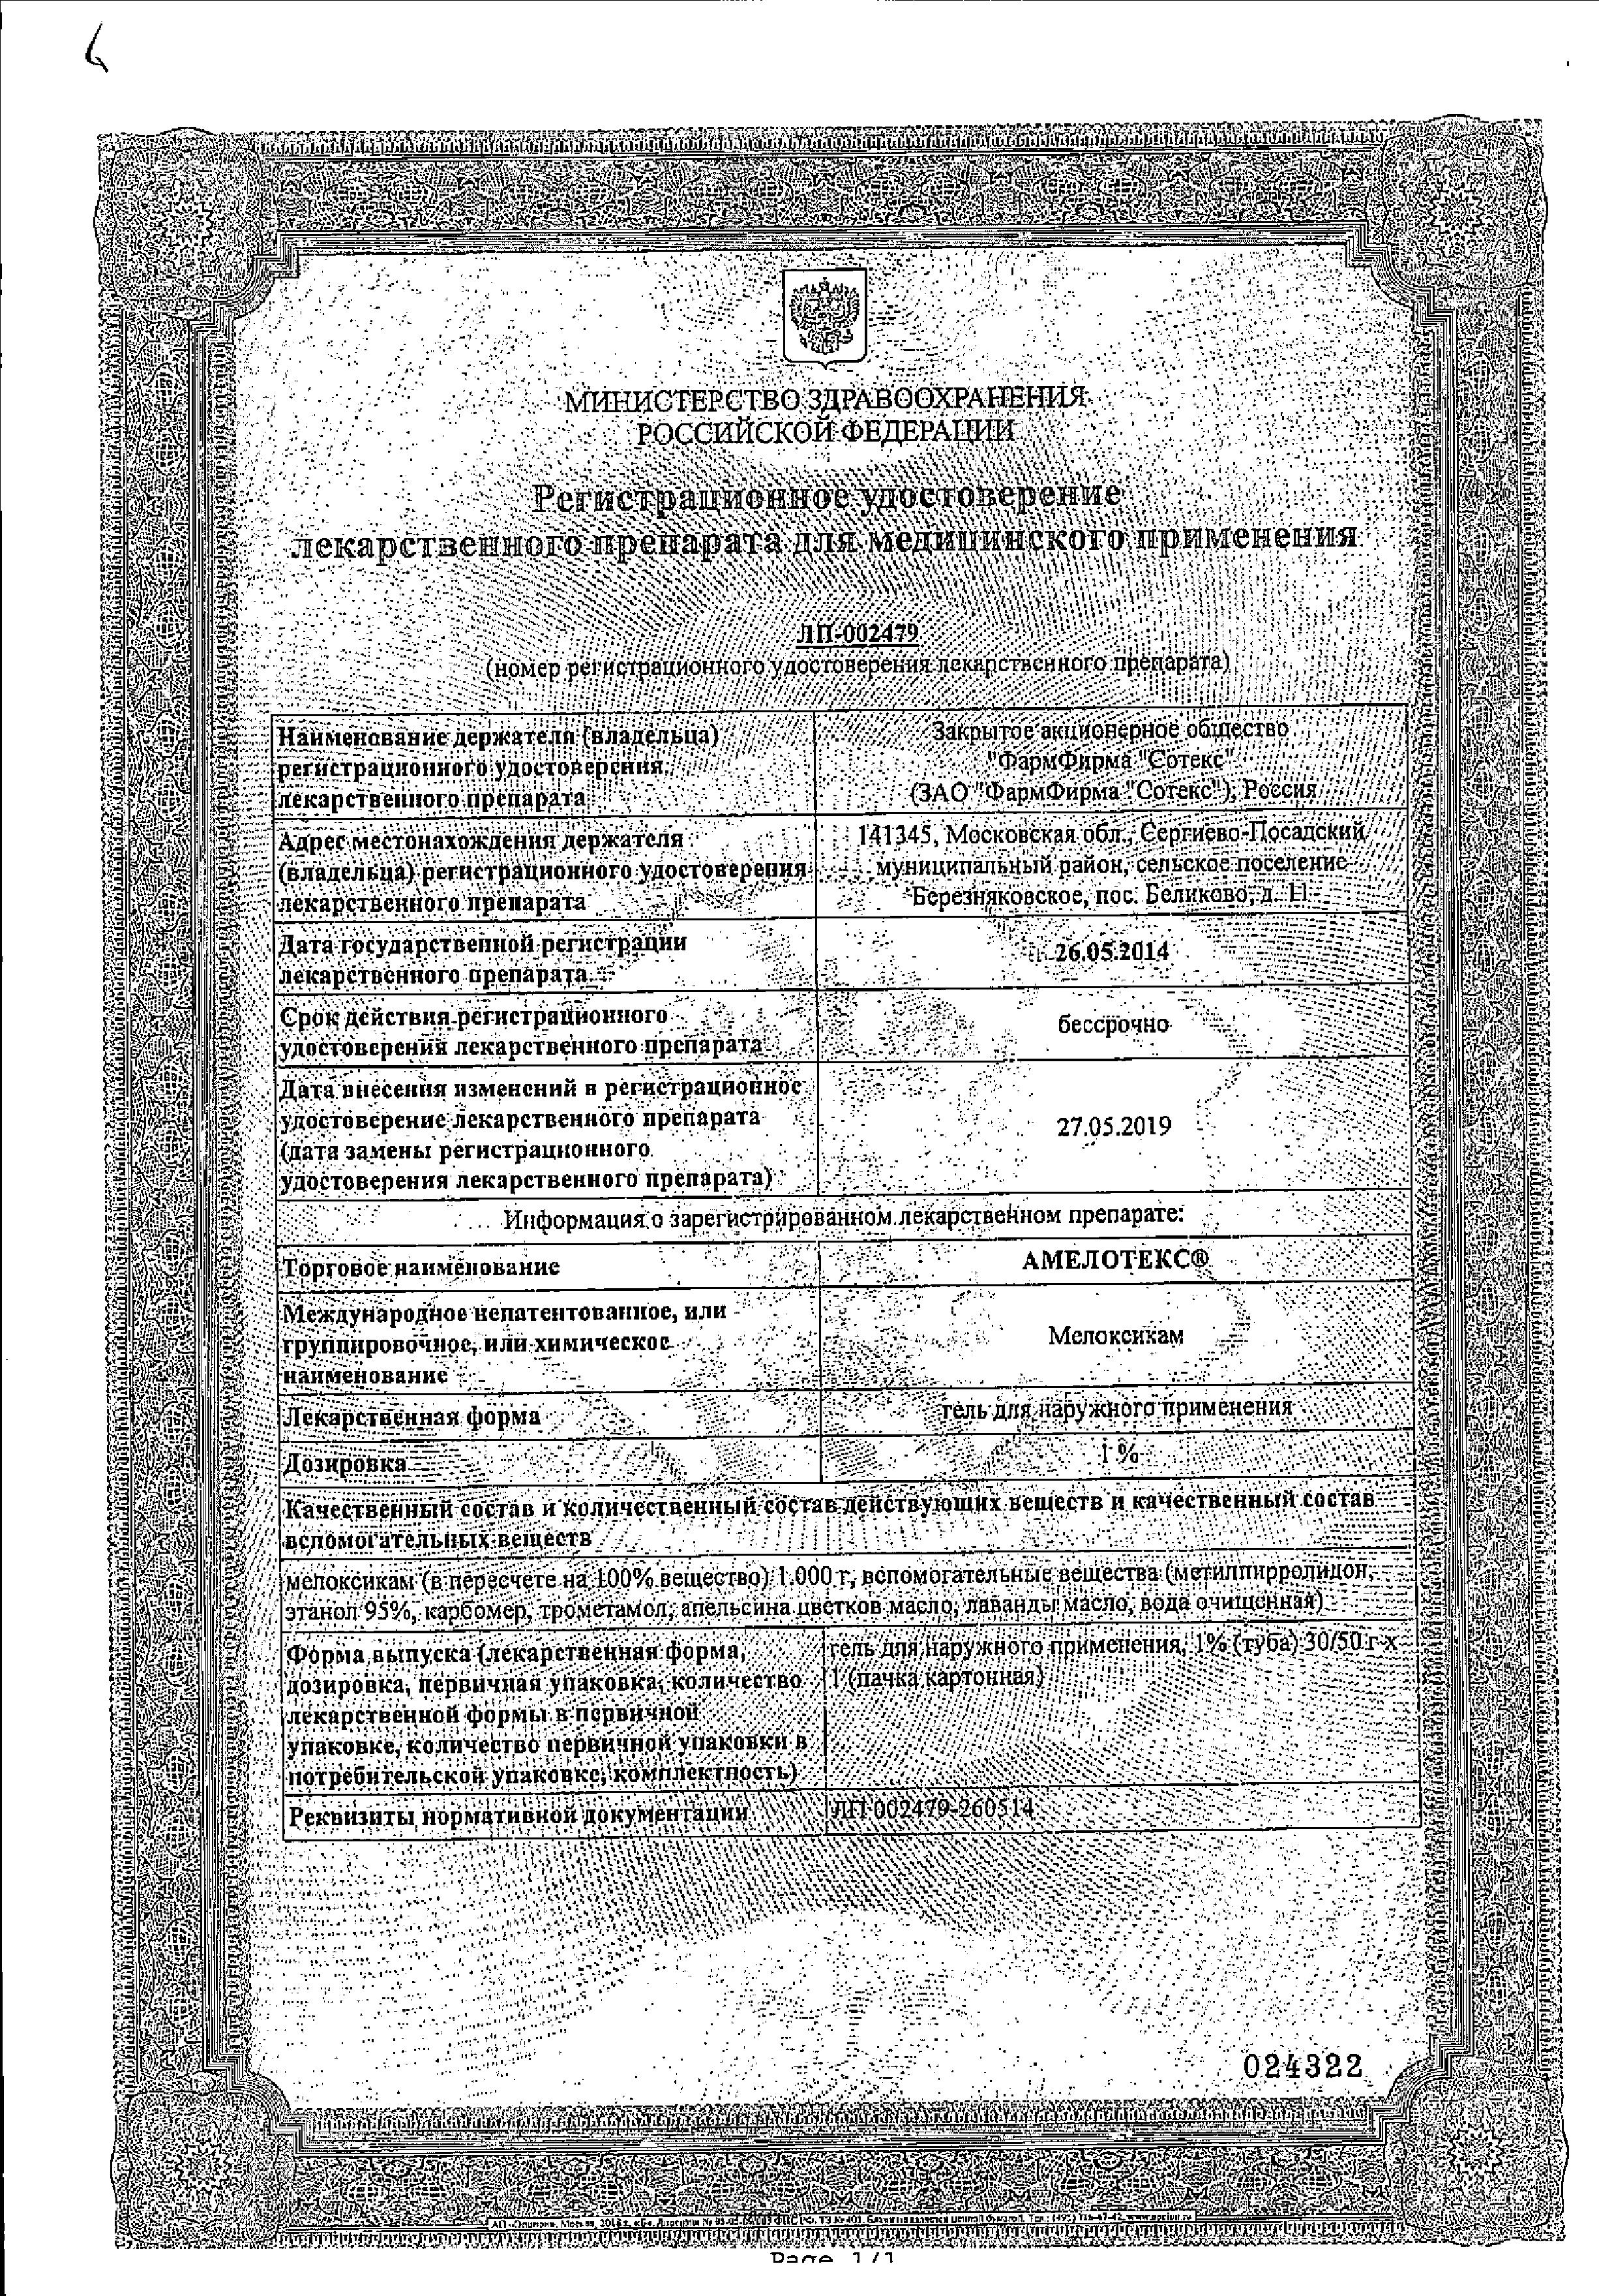 Амелотекс сертификат